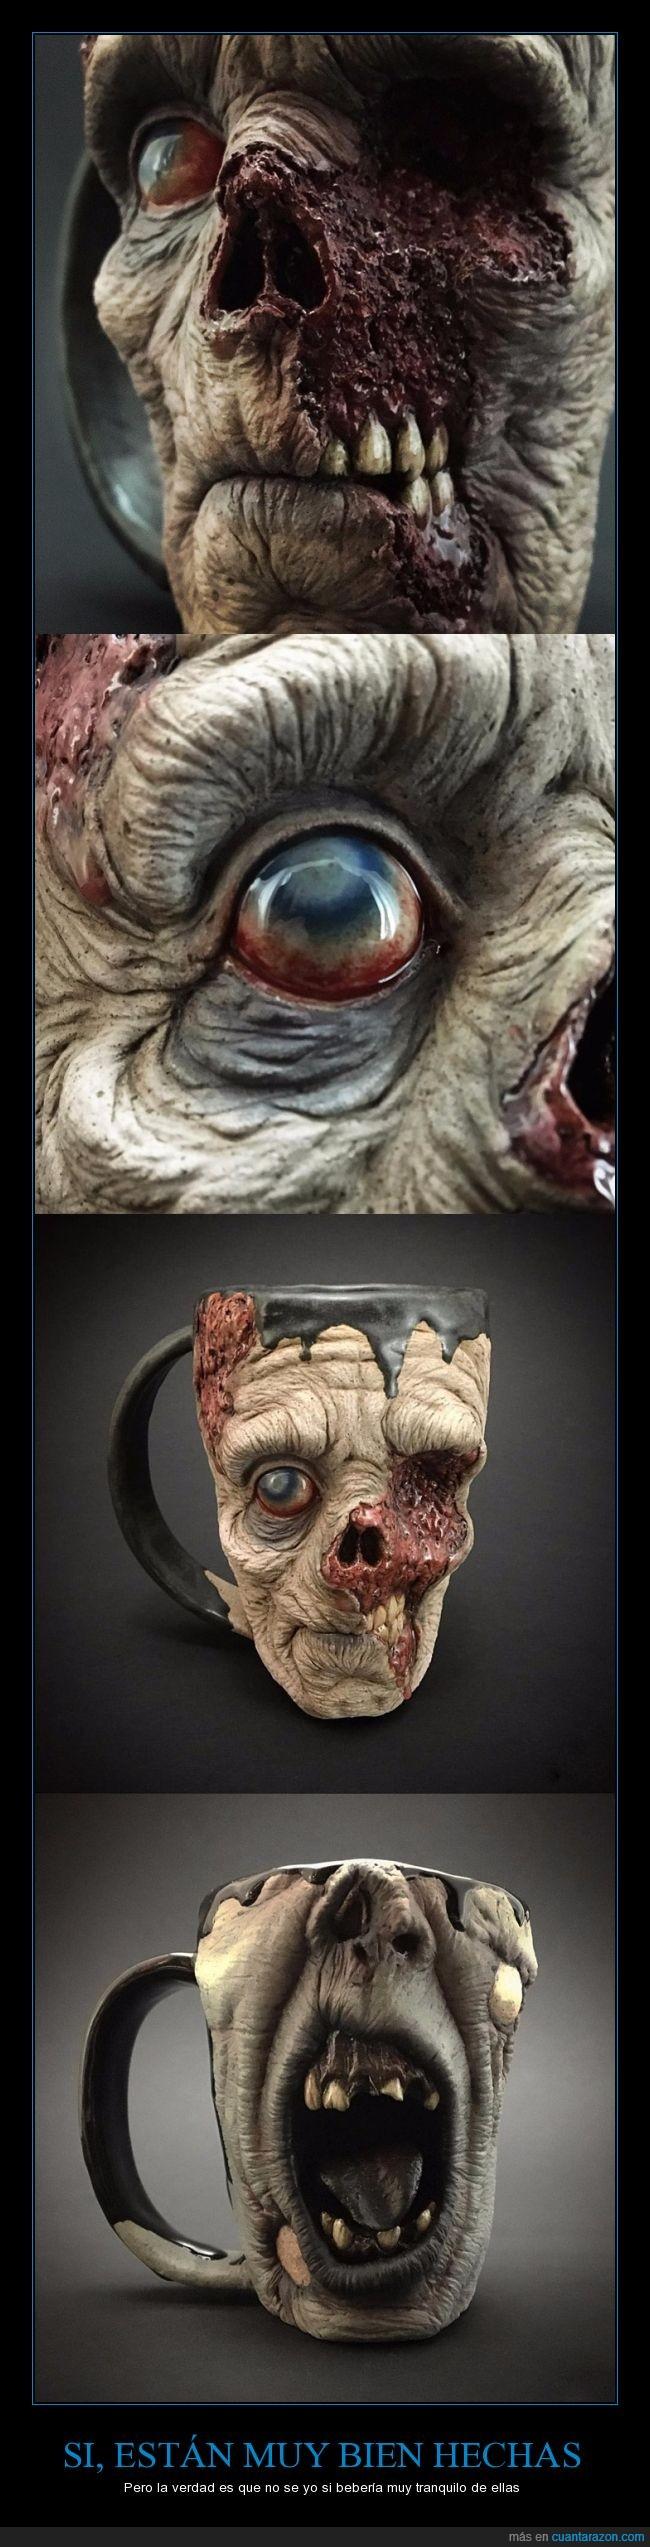 apocalipsis,asco,boca,café,desayuno,realista,taza,zombie